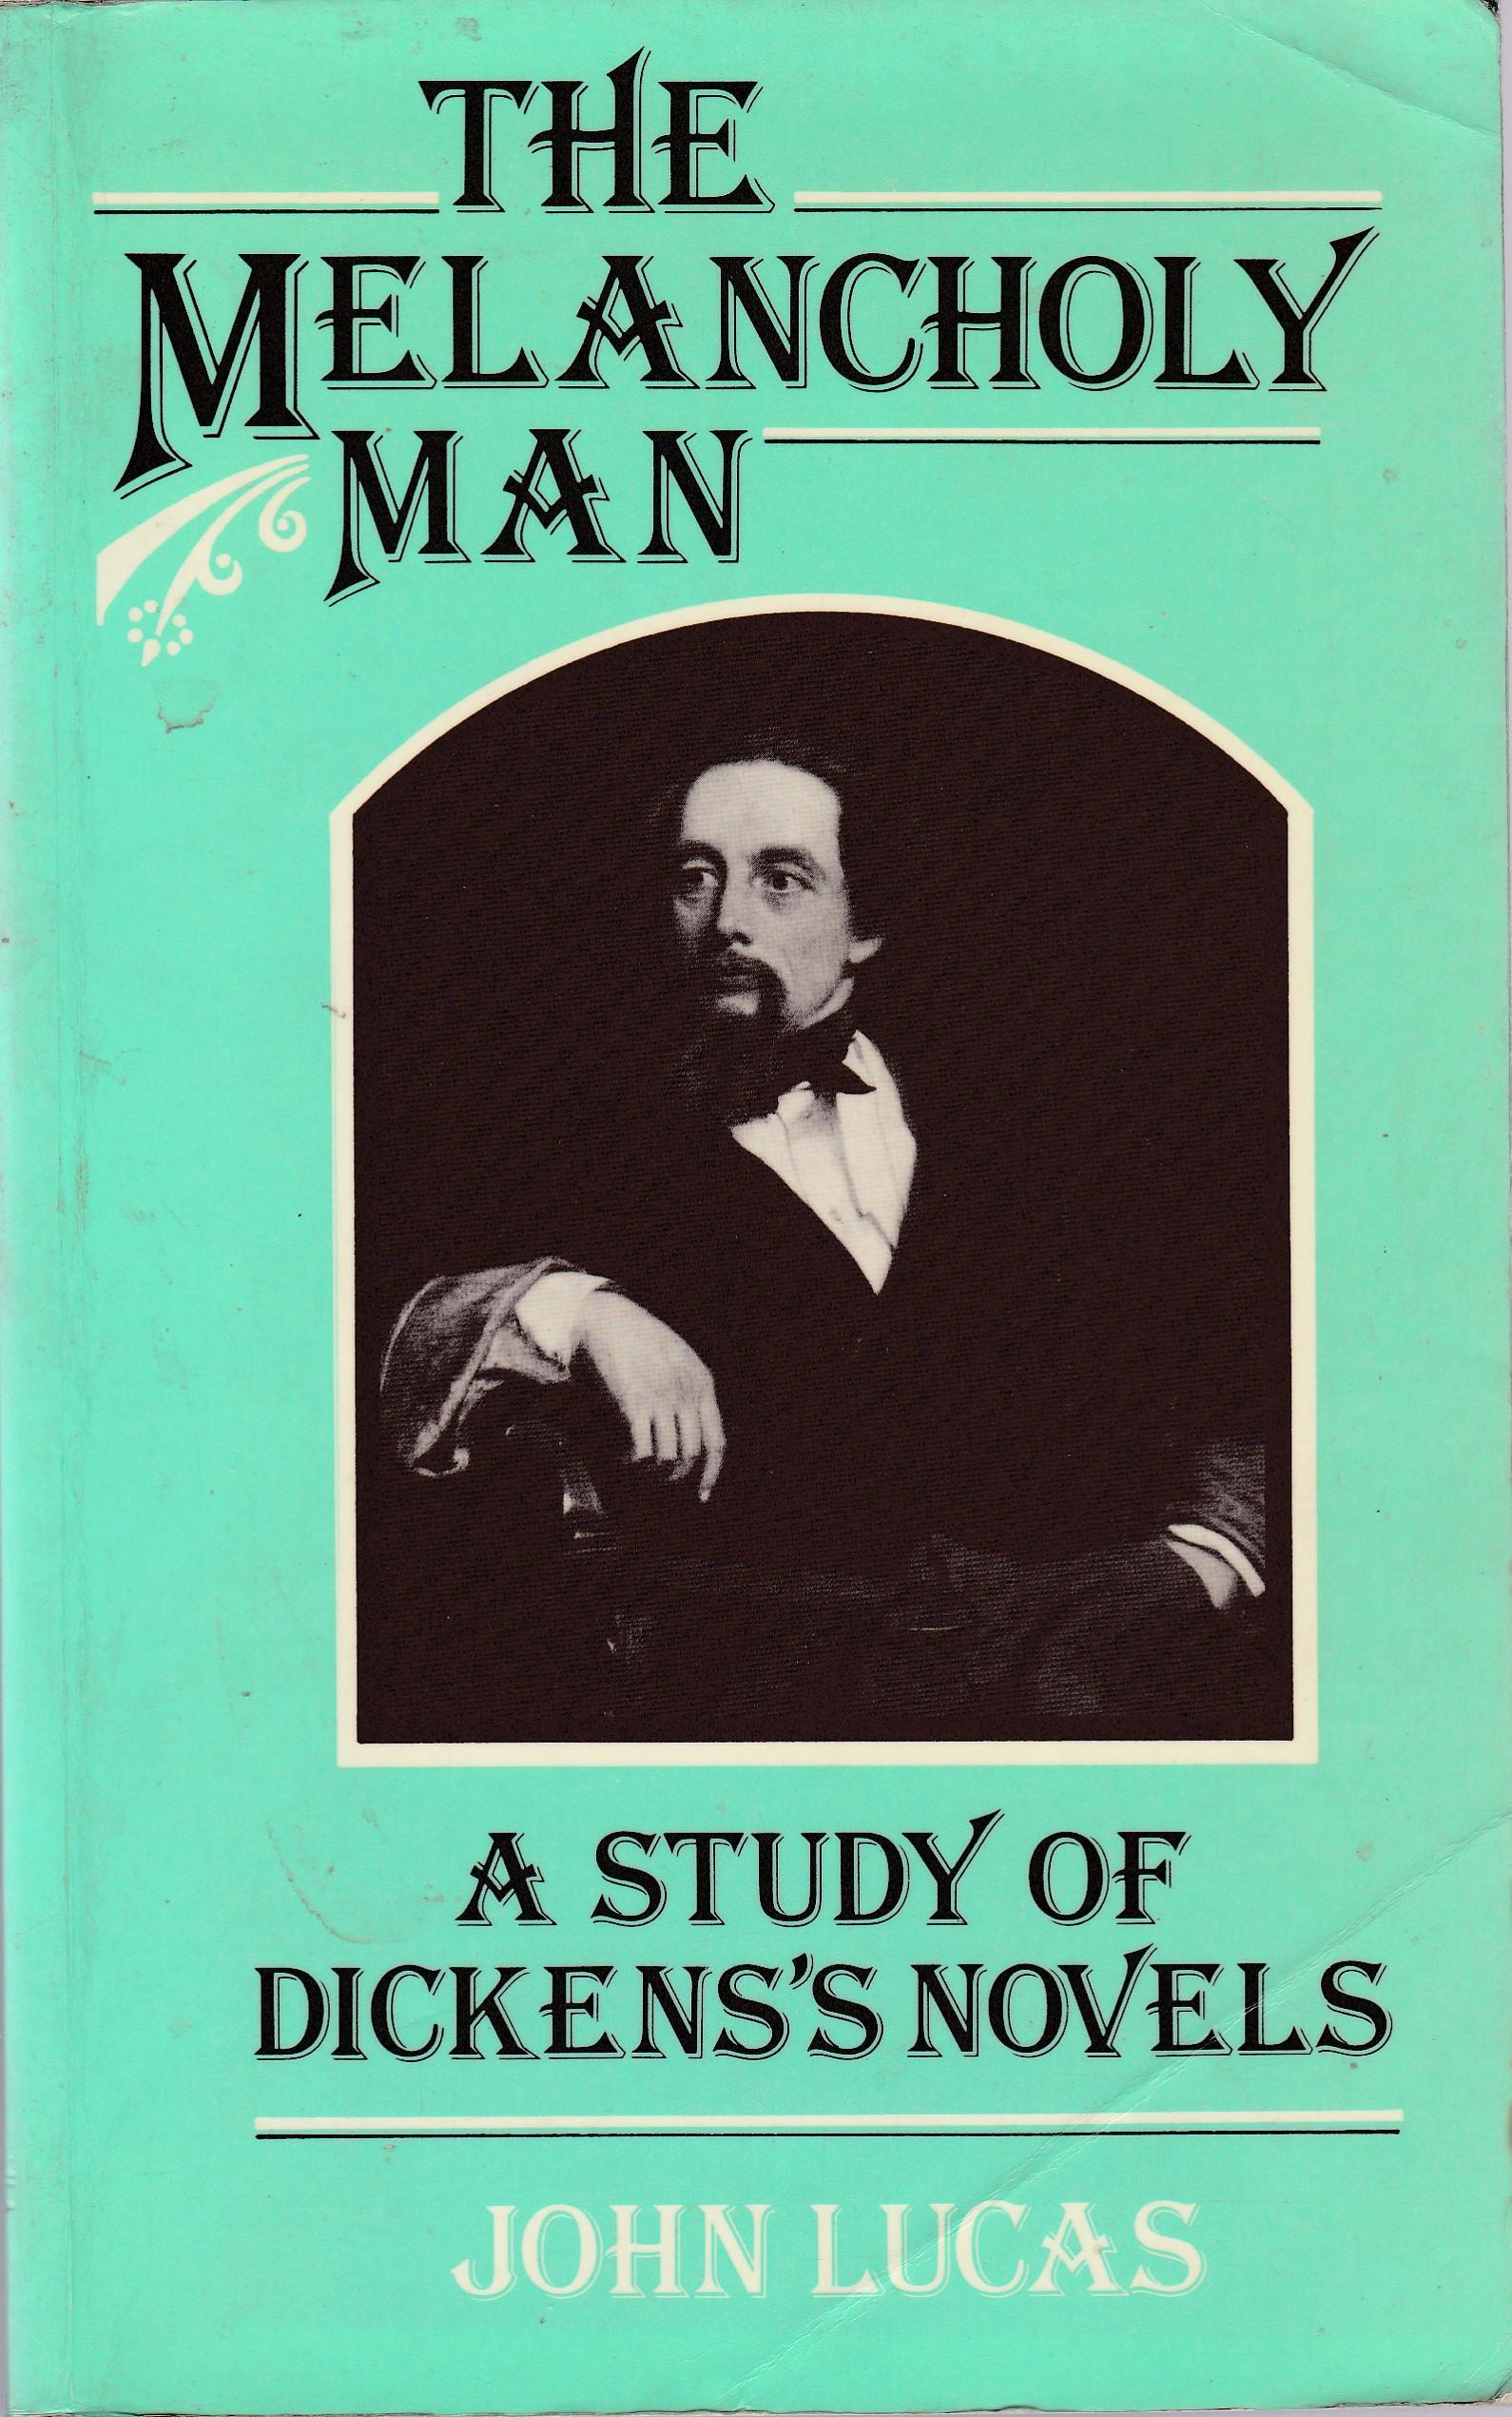 The Melancholy Man